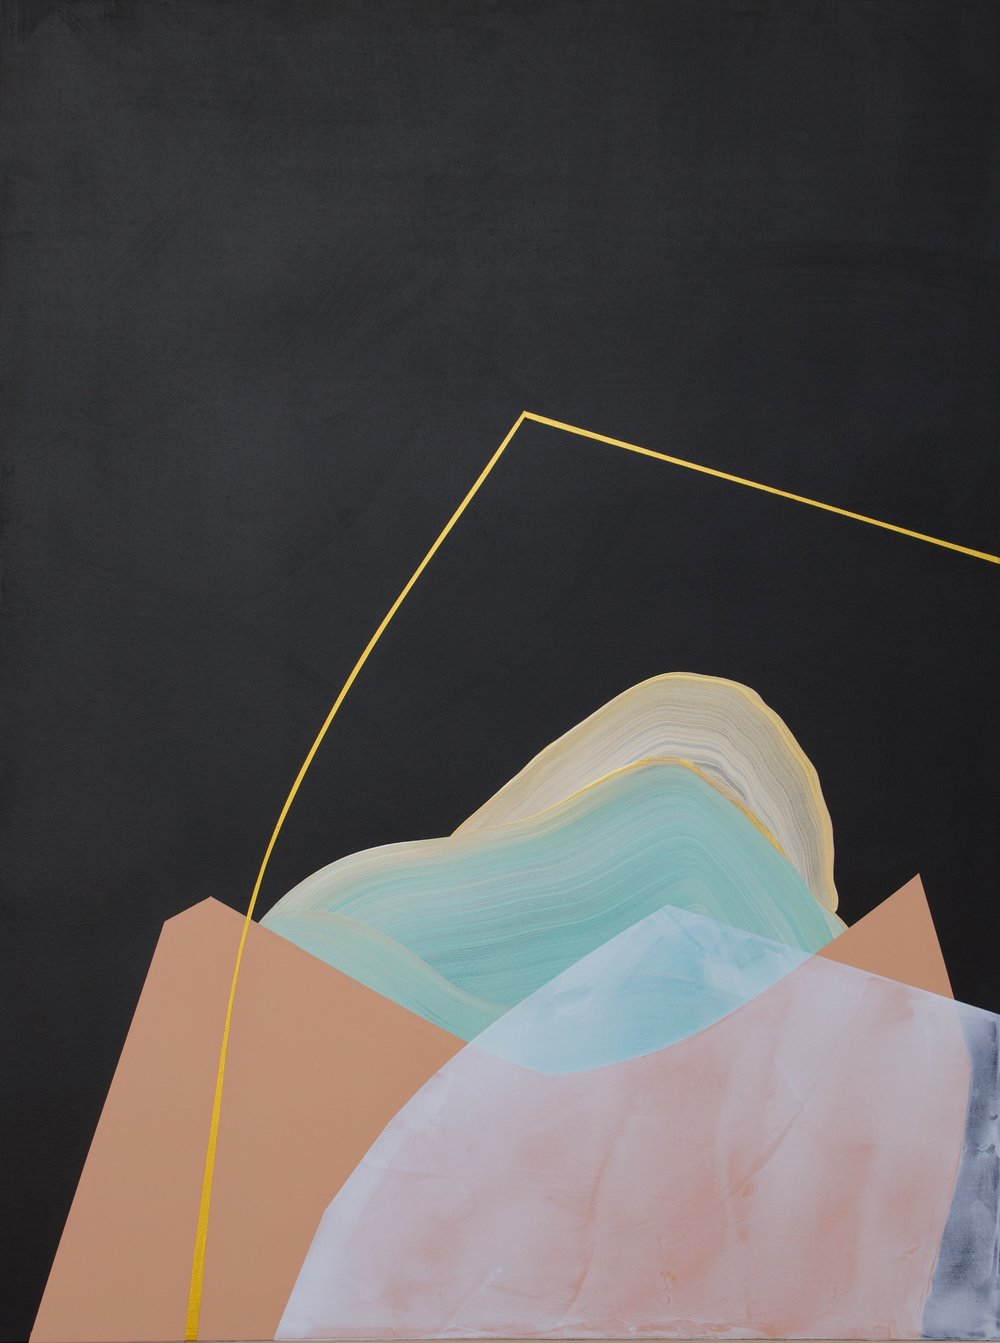 March Ahead  Mixed acrylic medium on canvas 40x30 inches $1100.00